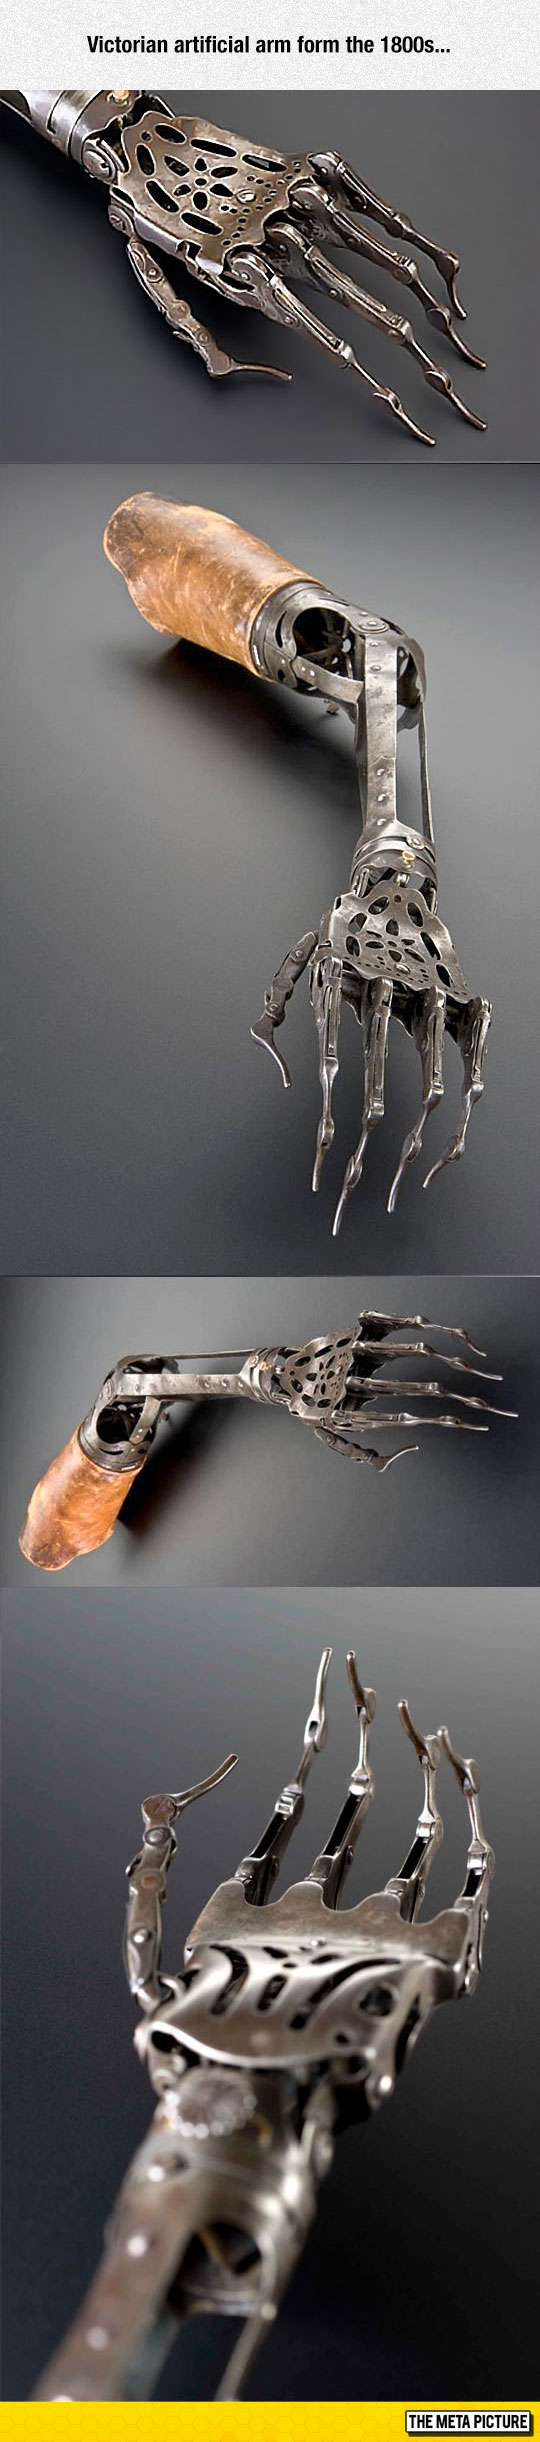 cool-artificial-arm-victorian-antique-art